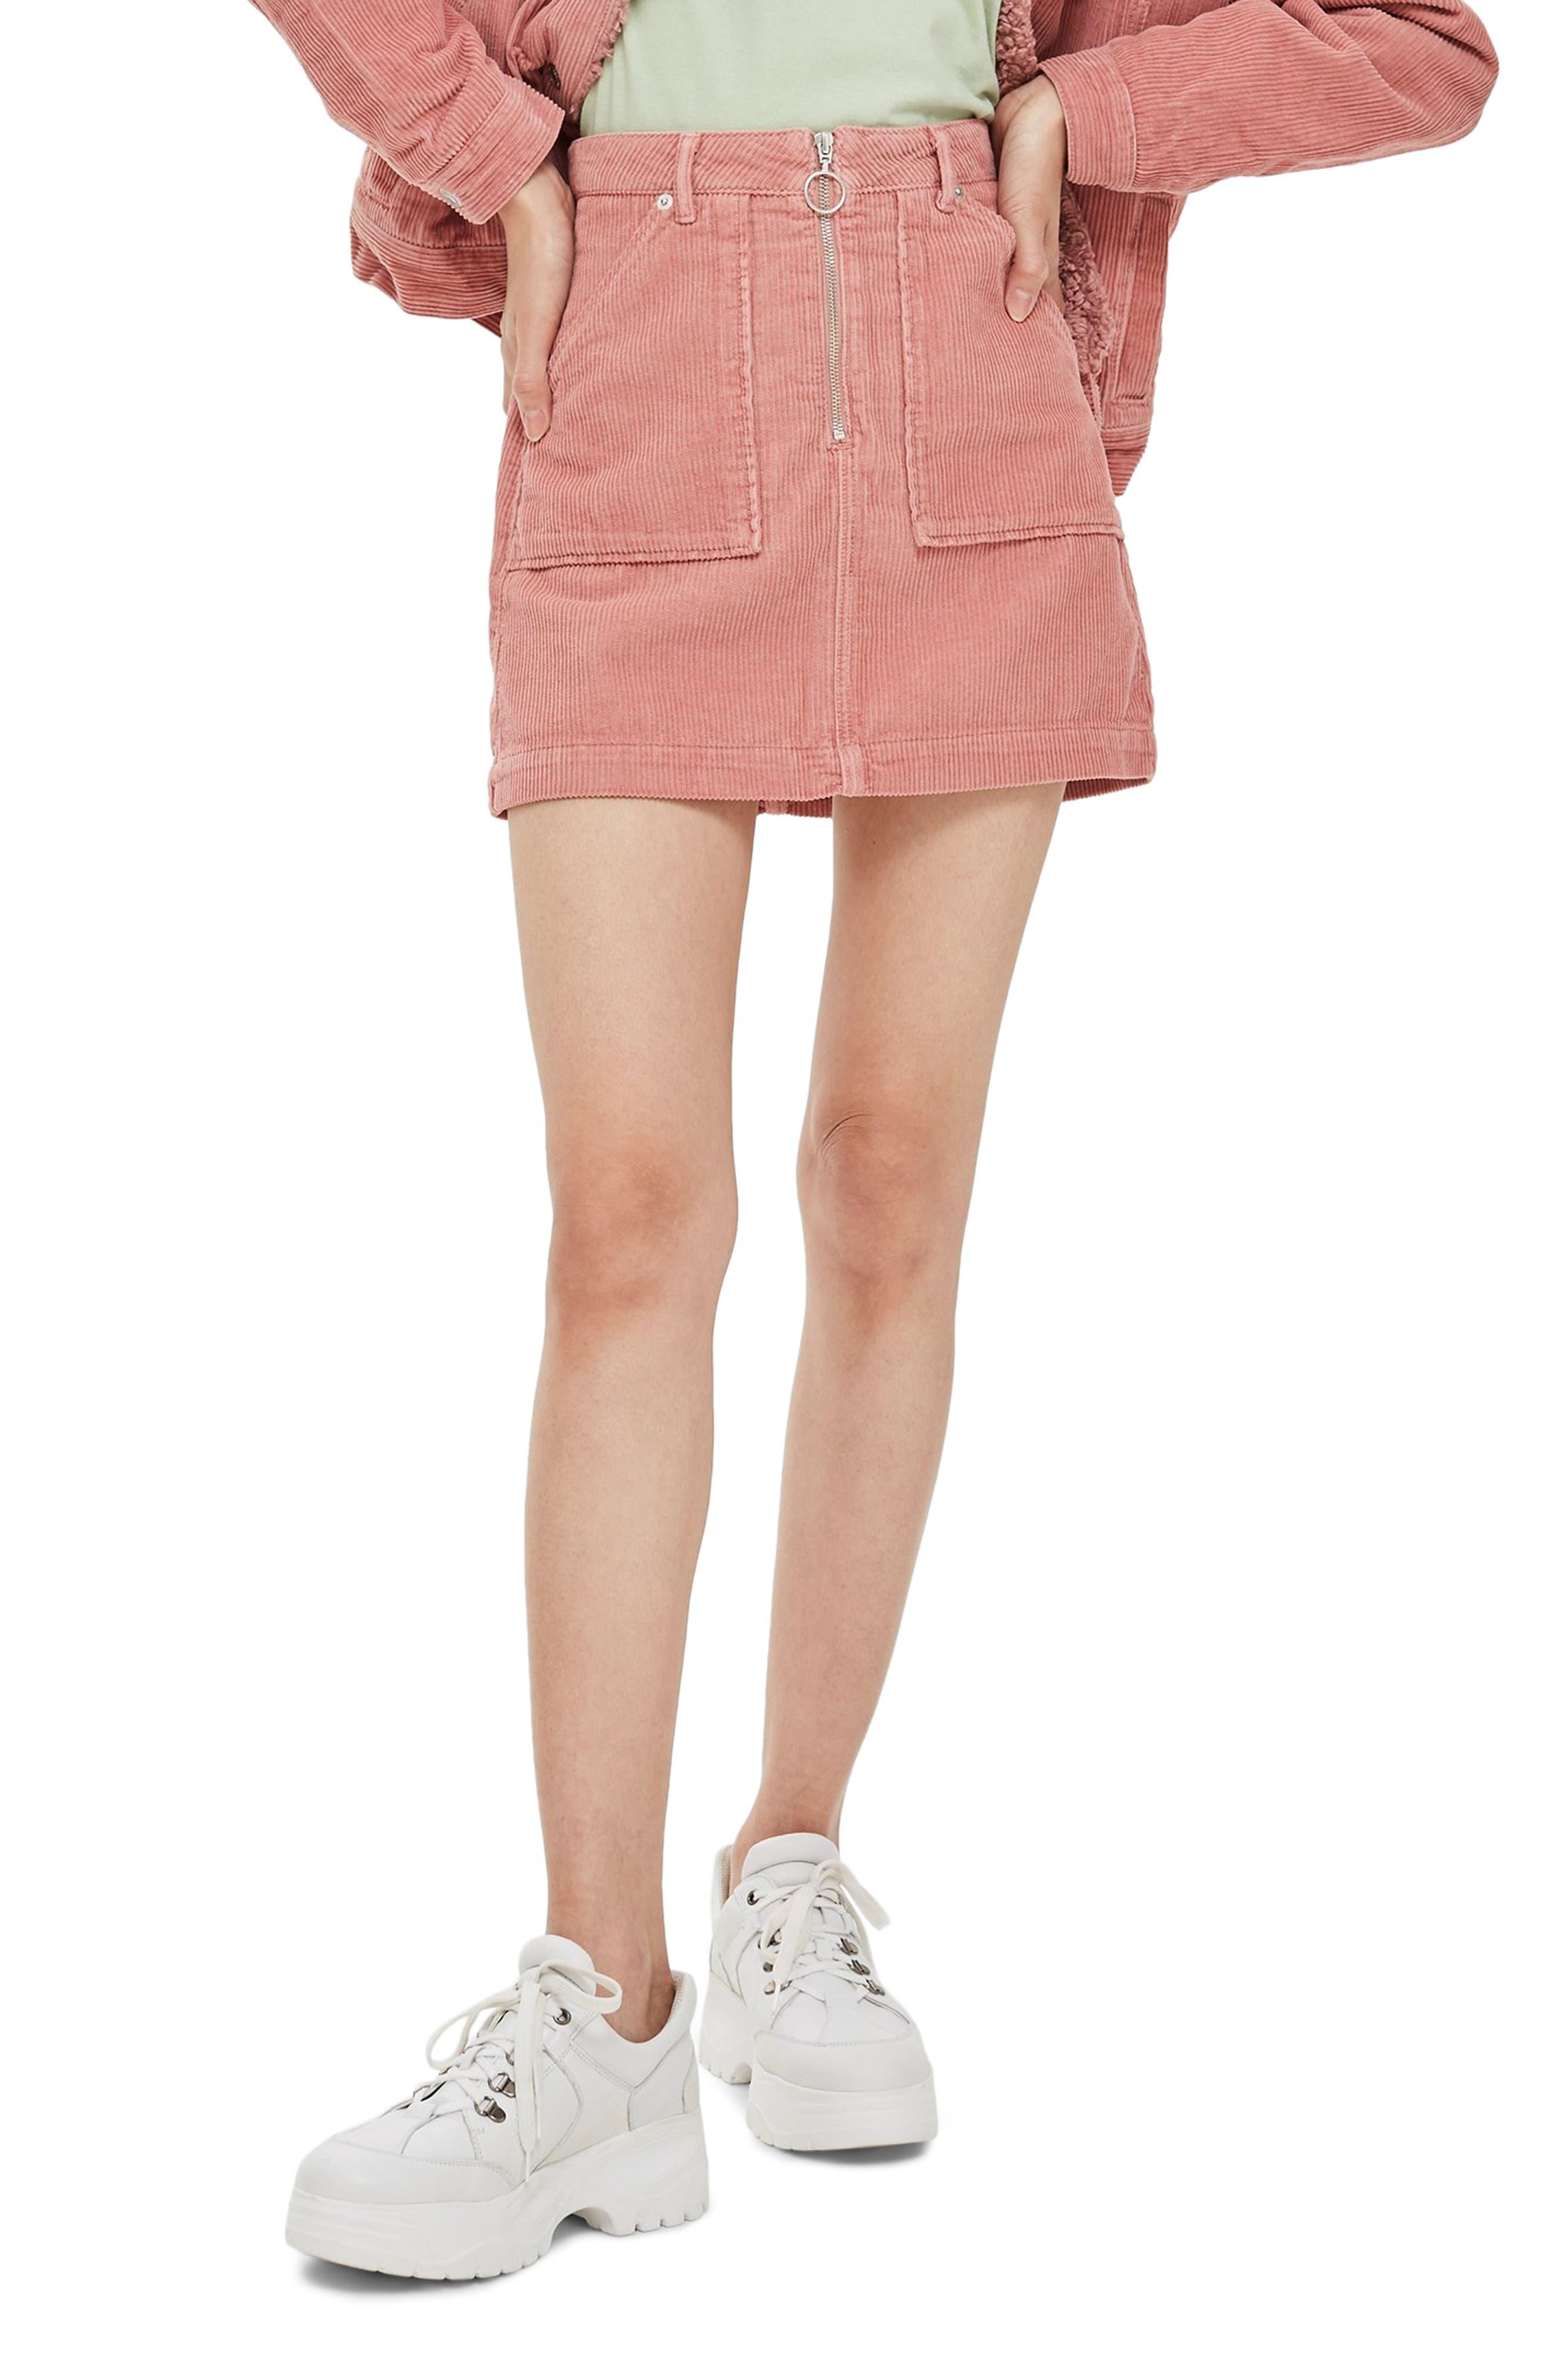 Topshop Front Zip Corduroy Miniskirt, US (fits like 16-18) - Pink